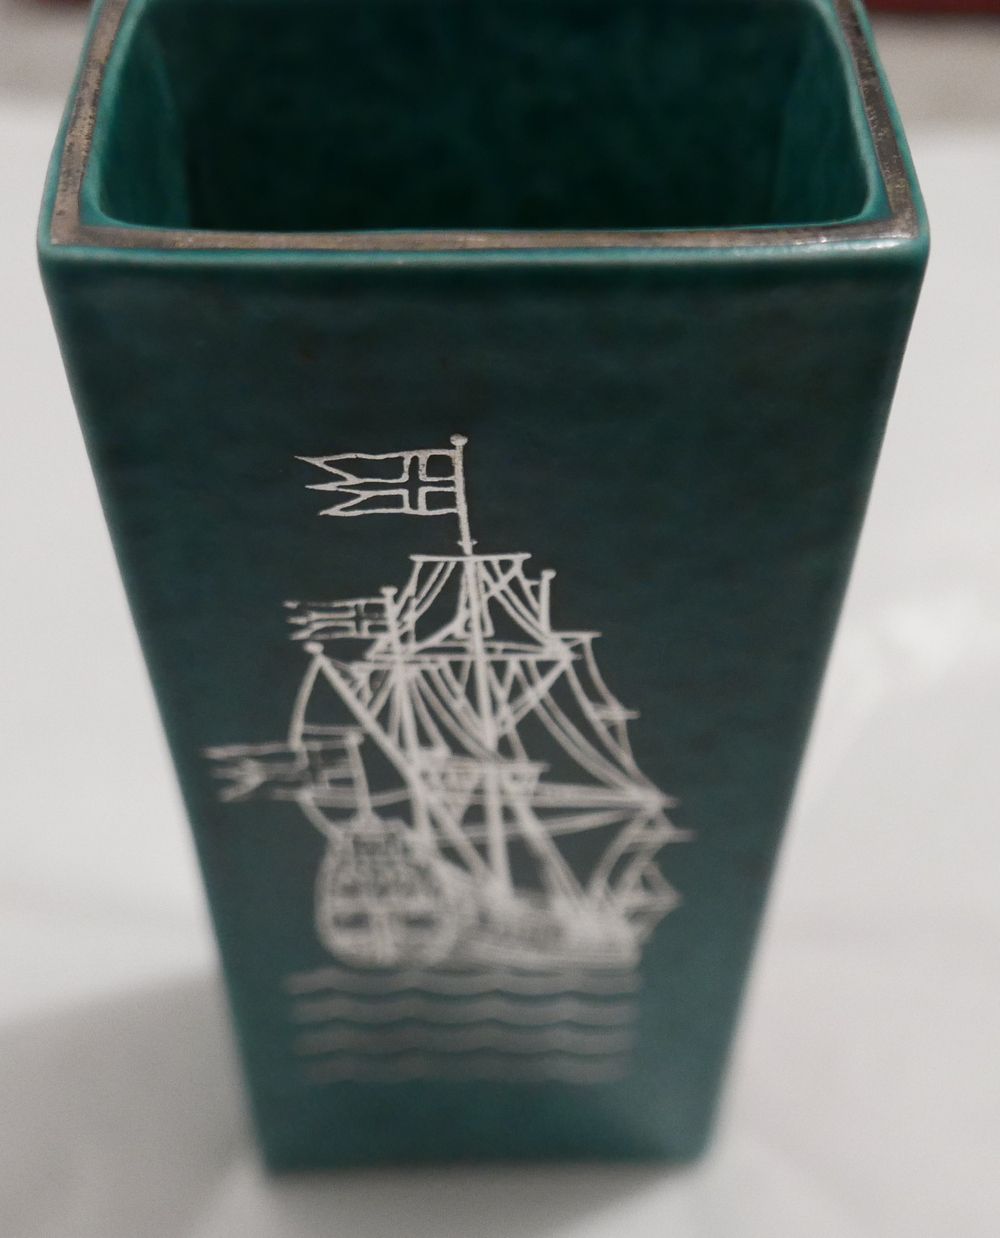 "Lot 62 - Gustavsberg Argenta Wasa 1628 Namnden Green Slab Vase approx 6 3/4"" (174mm) tall"